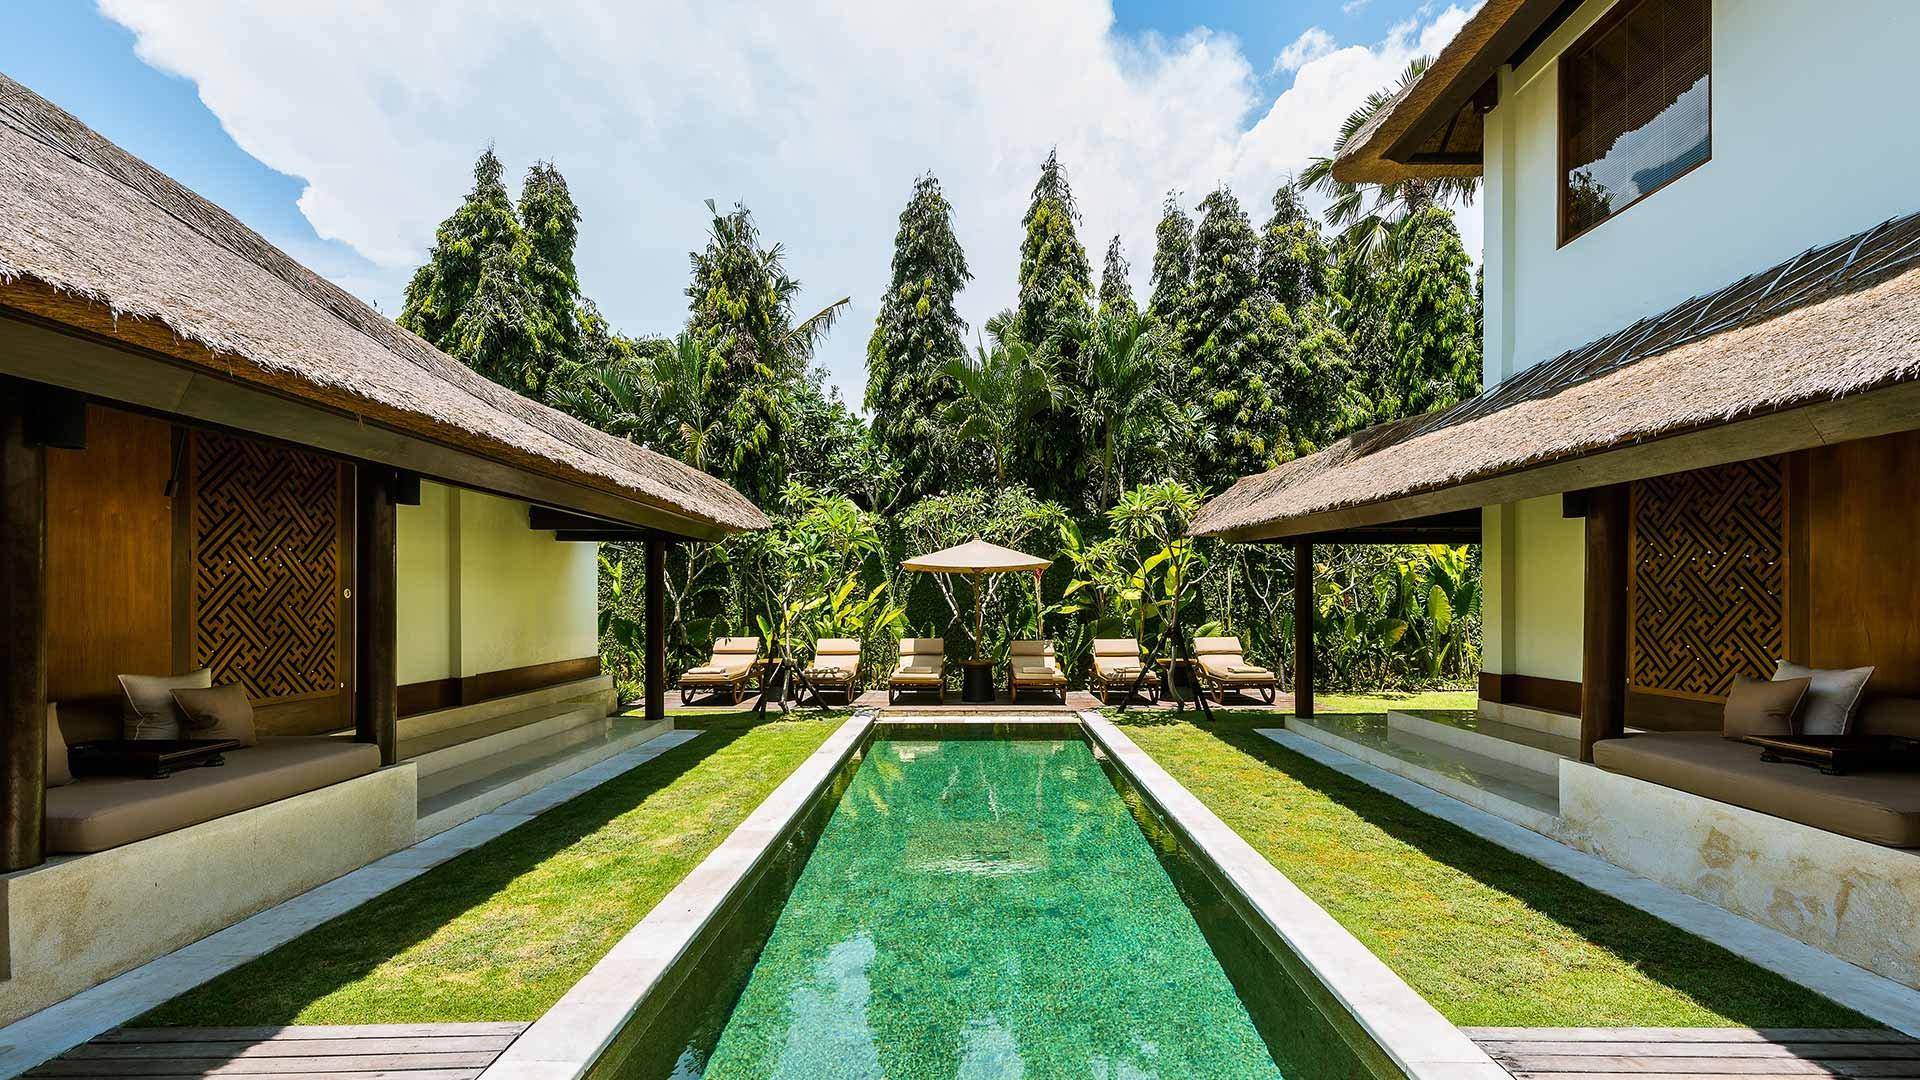 Three Bedroom Villa Pool View Club At The Legian Bali Lhm Hotels The Legian Bali